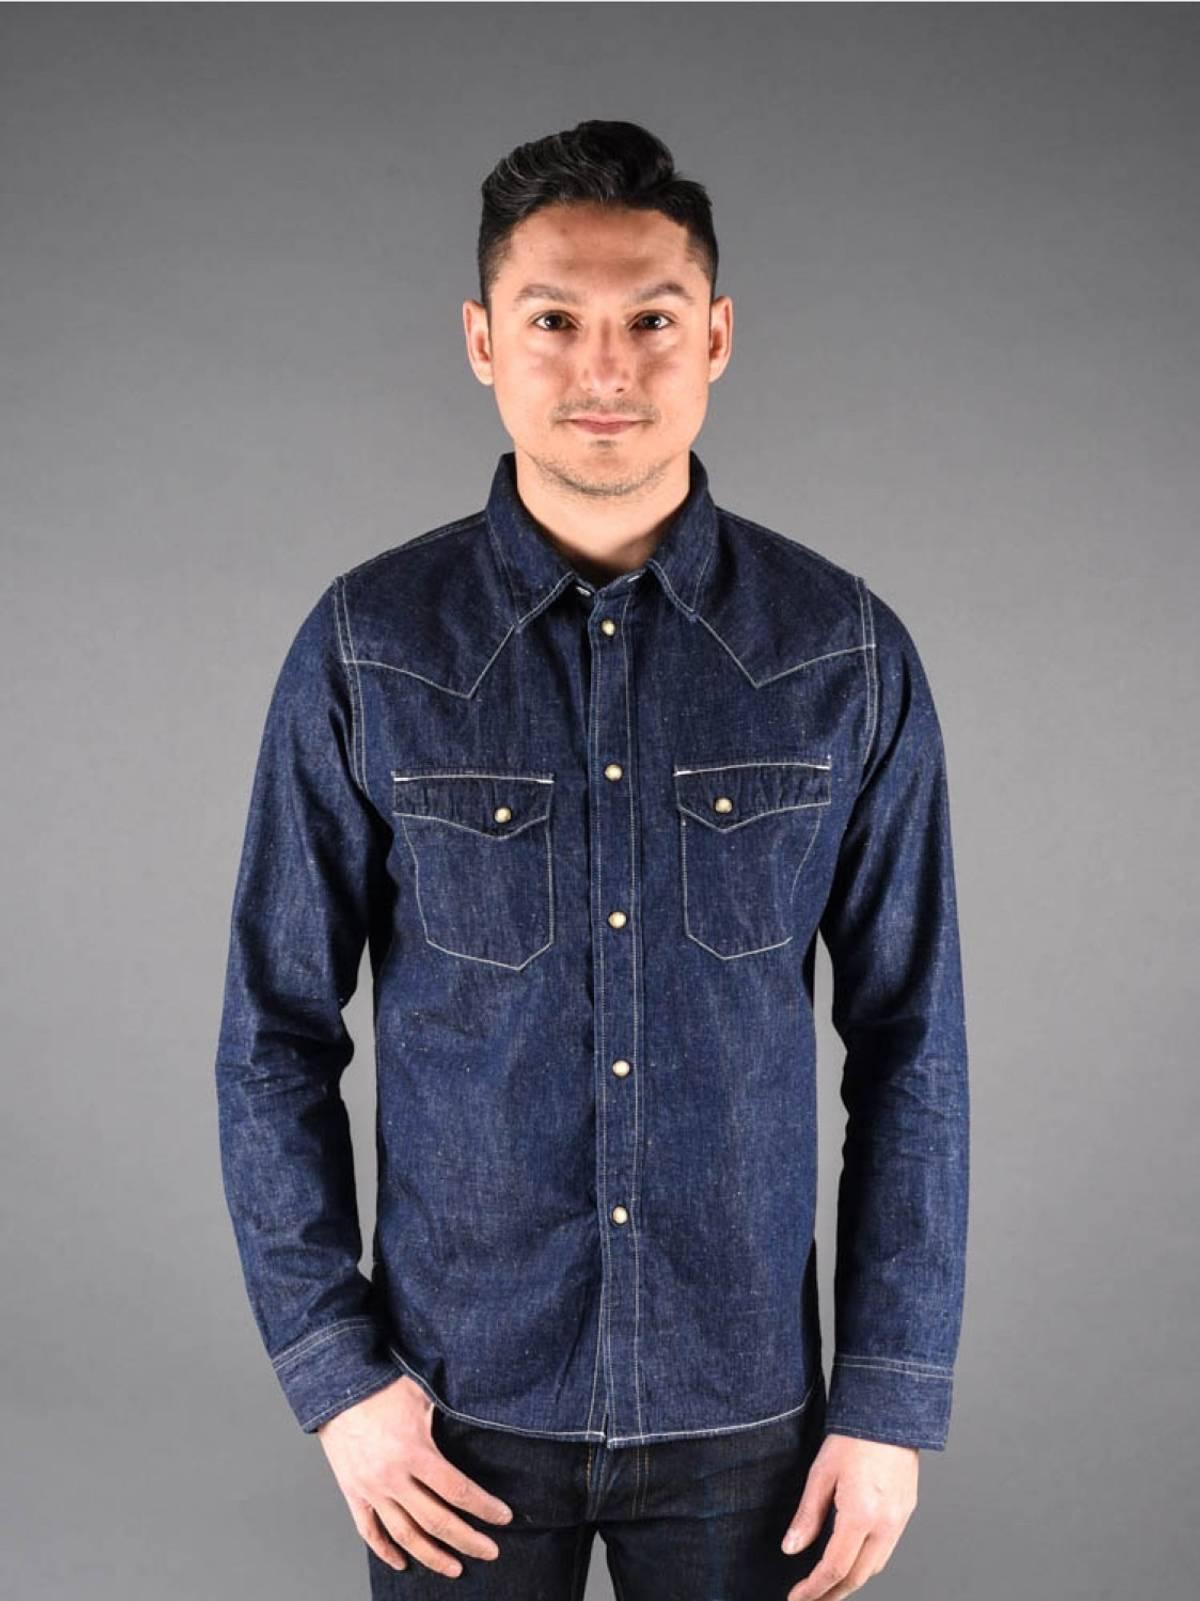 e807314901 Pure Blue Japan 5 Oz. Knub Selvedge Western Shirt Size s - Shirts (Button  Ups) for Sale - Grailed